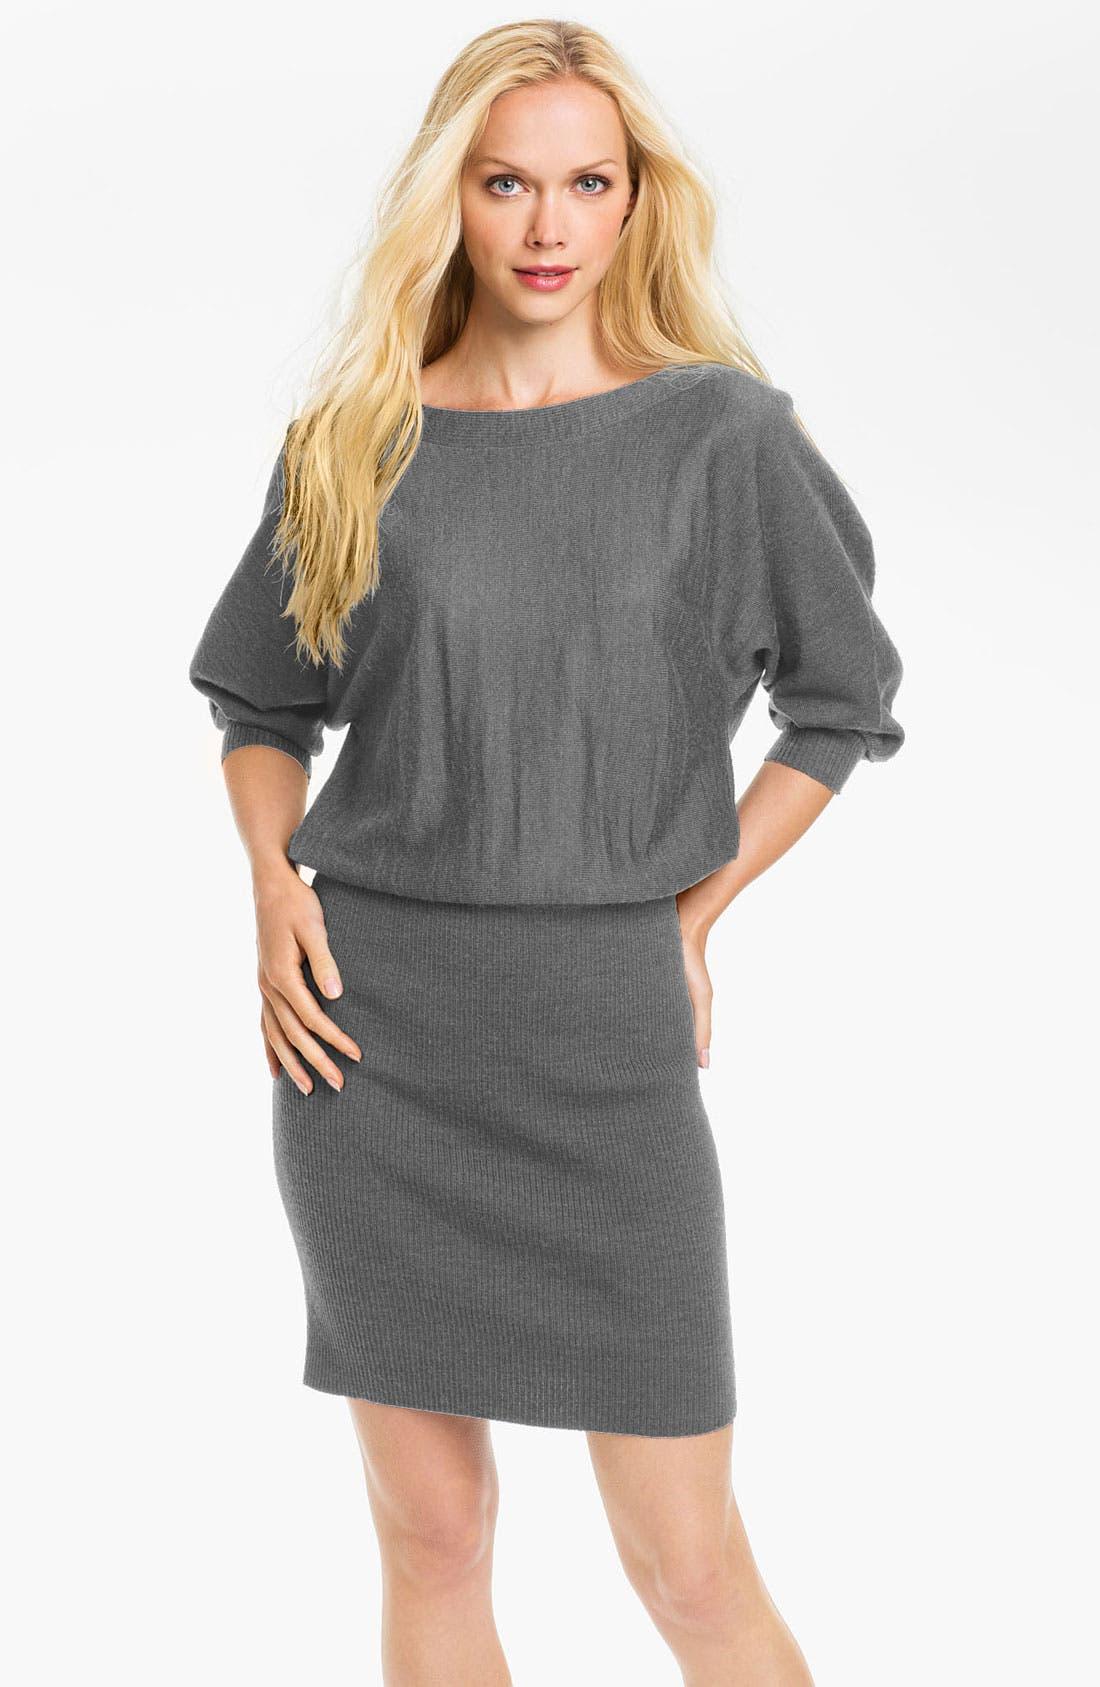 Alternate Image 1 Selected - Maggy London Blouson Sweater Dress